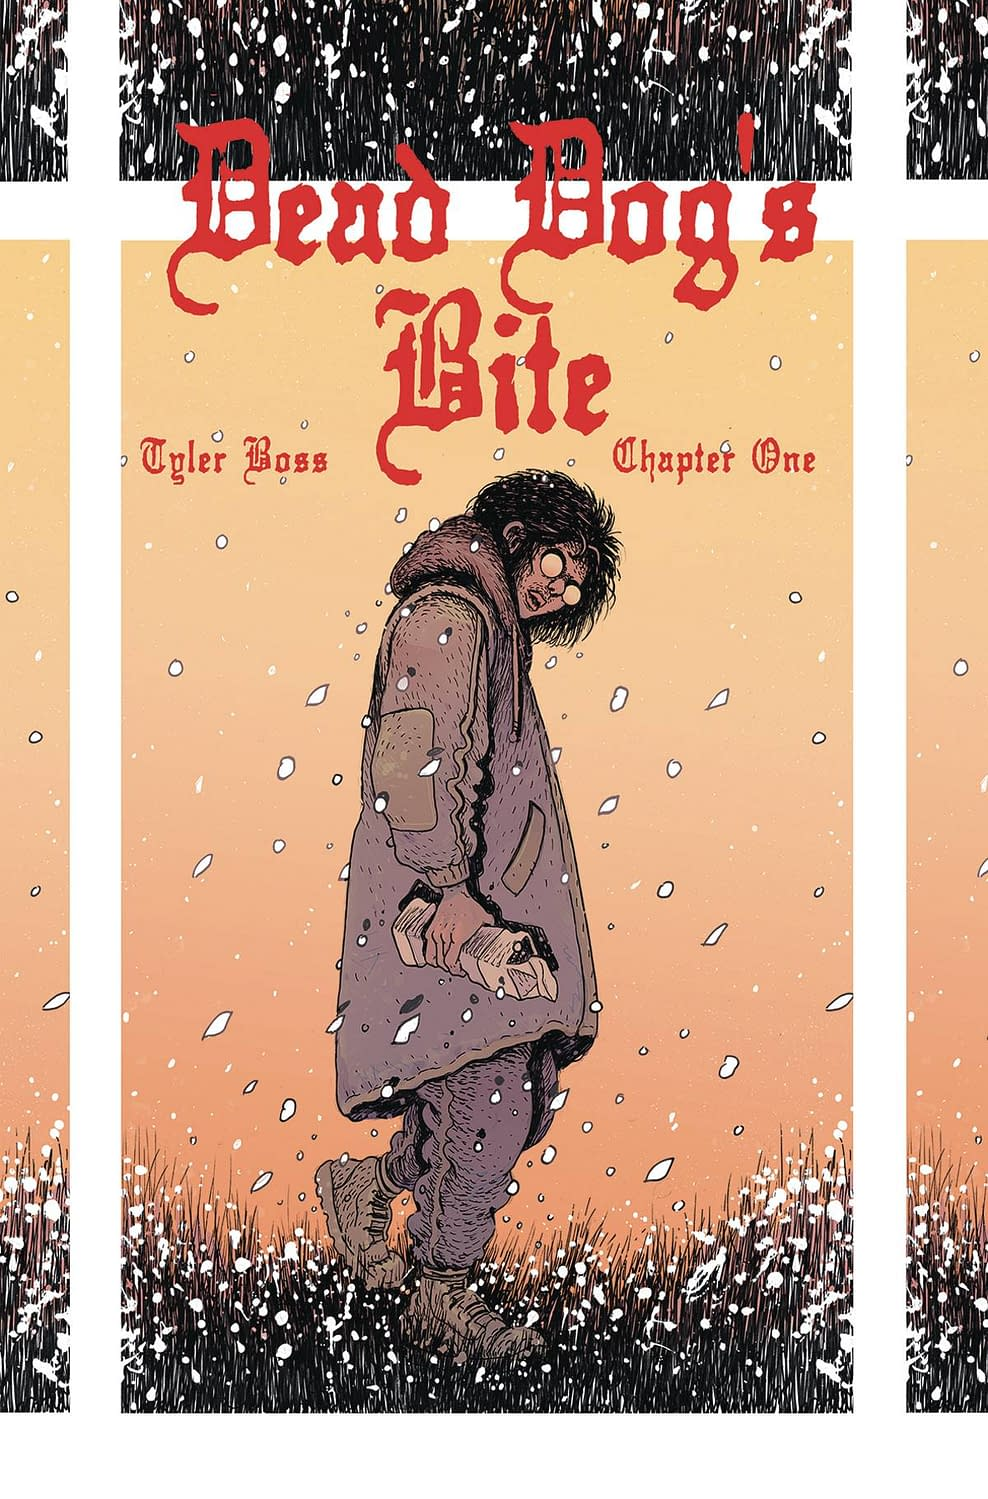 Dark Horse Comics March 2021 Solicitations In Full with James Stokoe DEAD DOGS BITE #1 (OF 4) CVR B BERTRAM (RES)